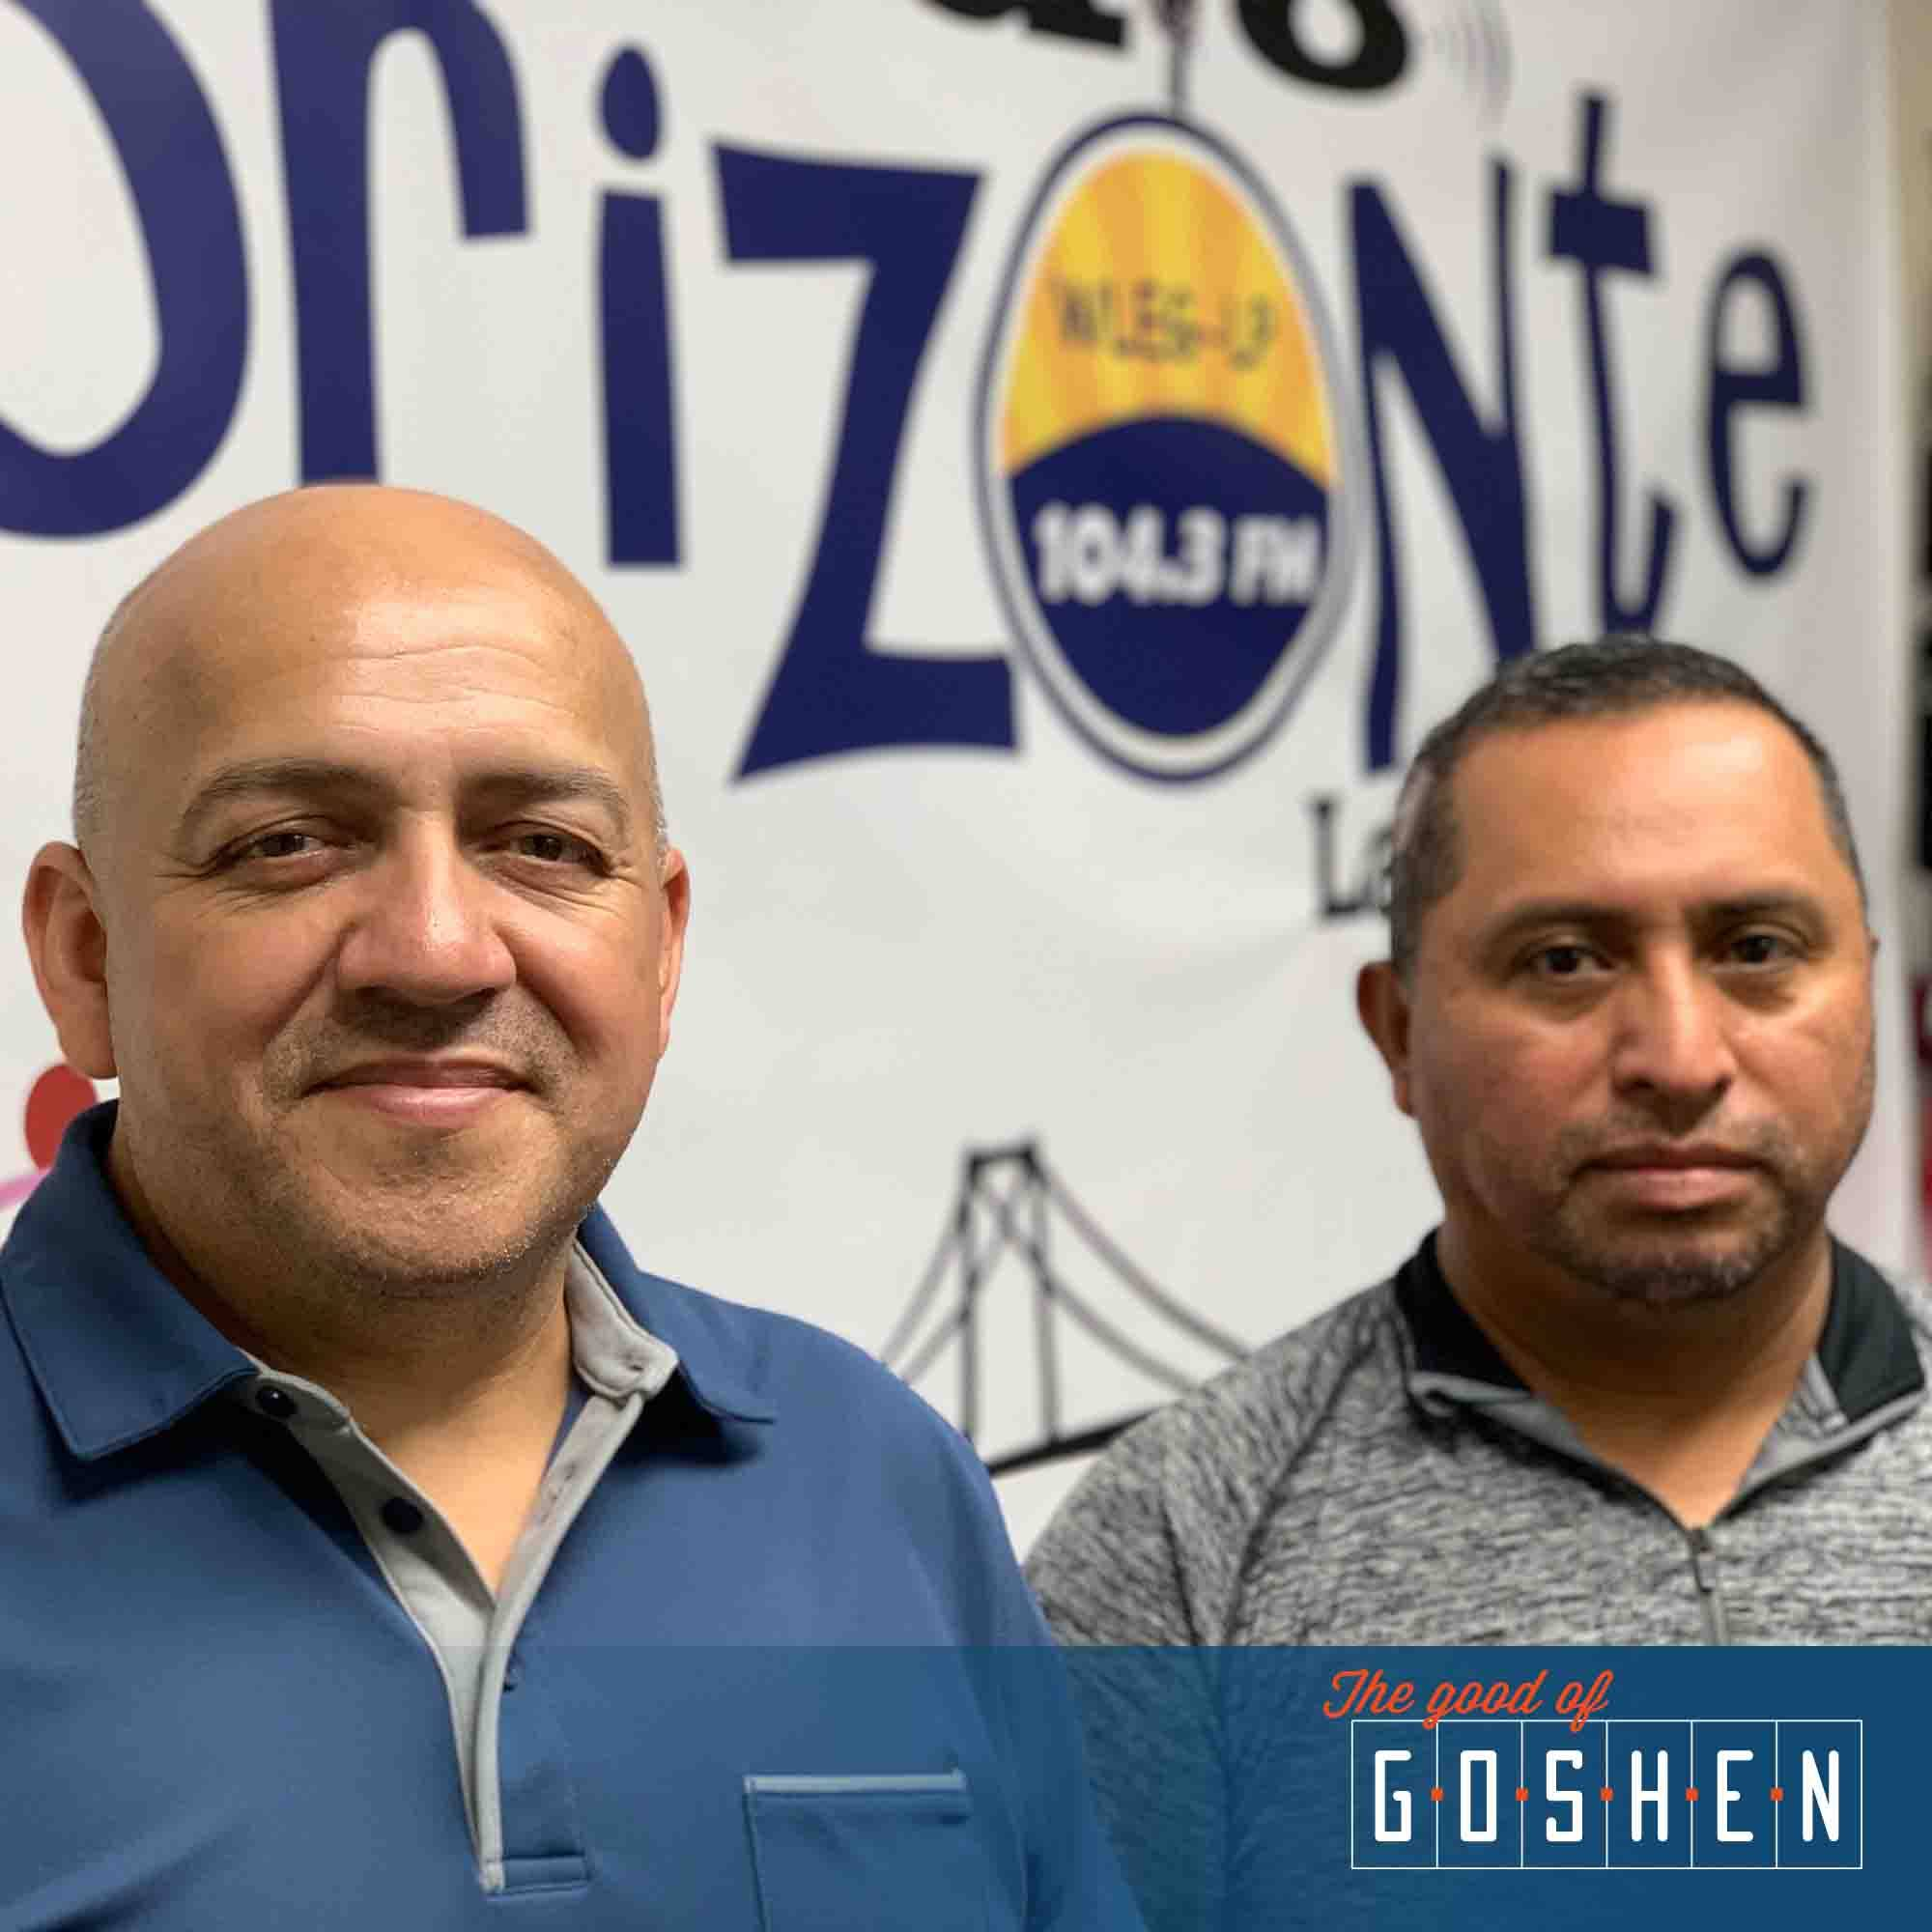 Manuel Cortez and Oscar Molina • The Good of Goshen